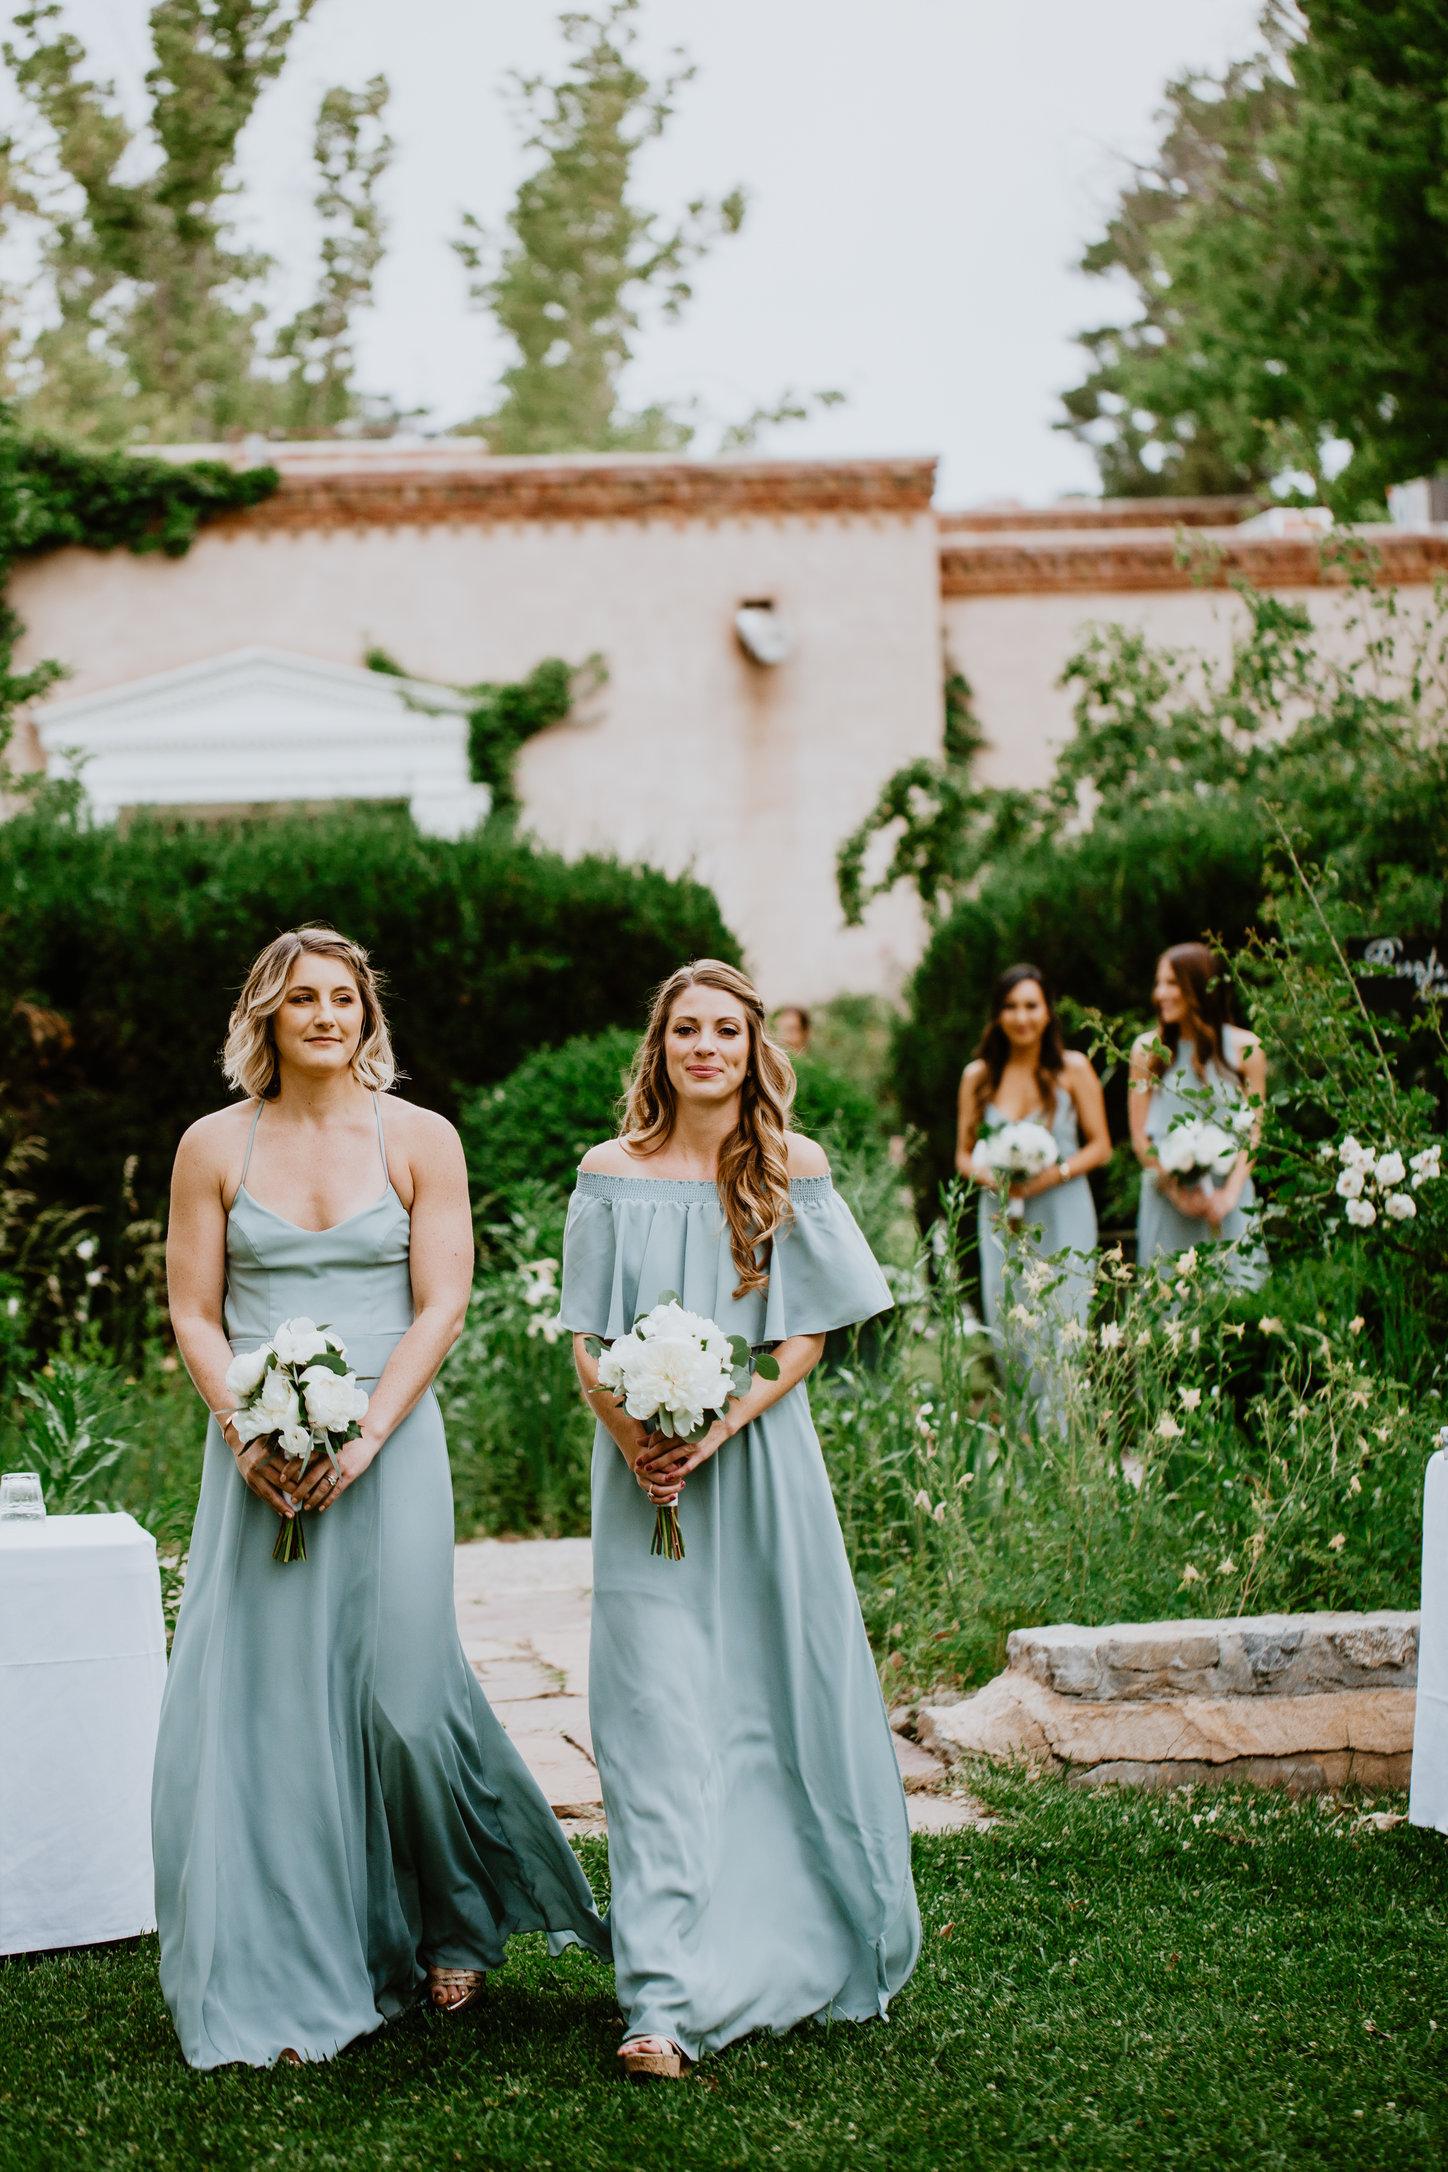 DandA-wedding-217.jpg